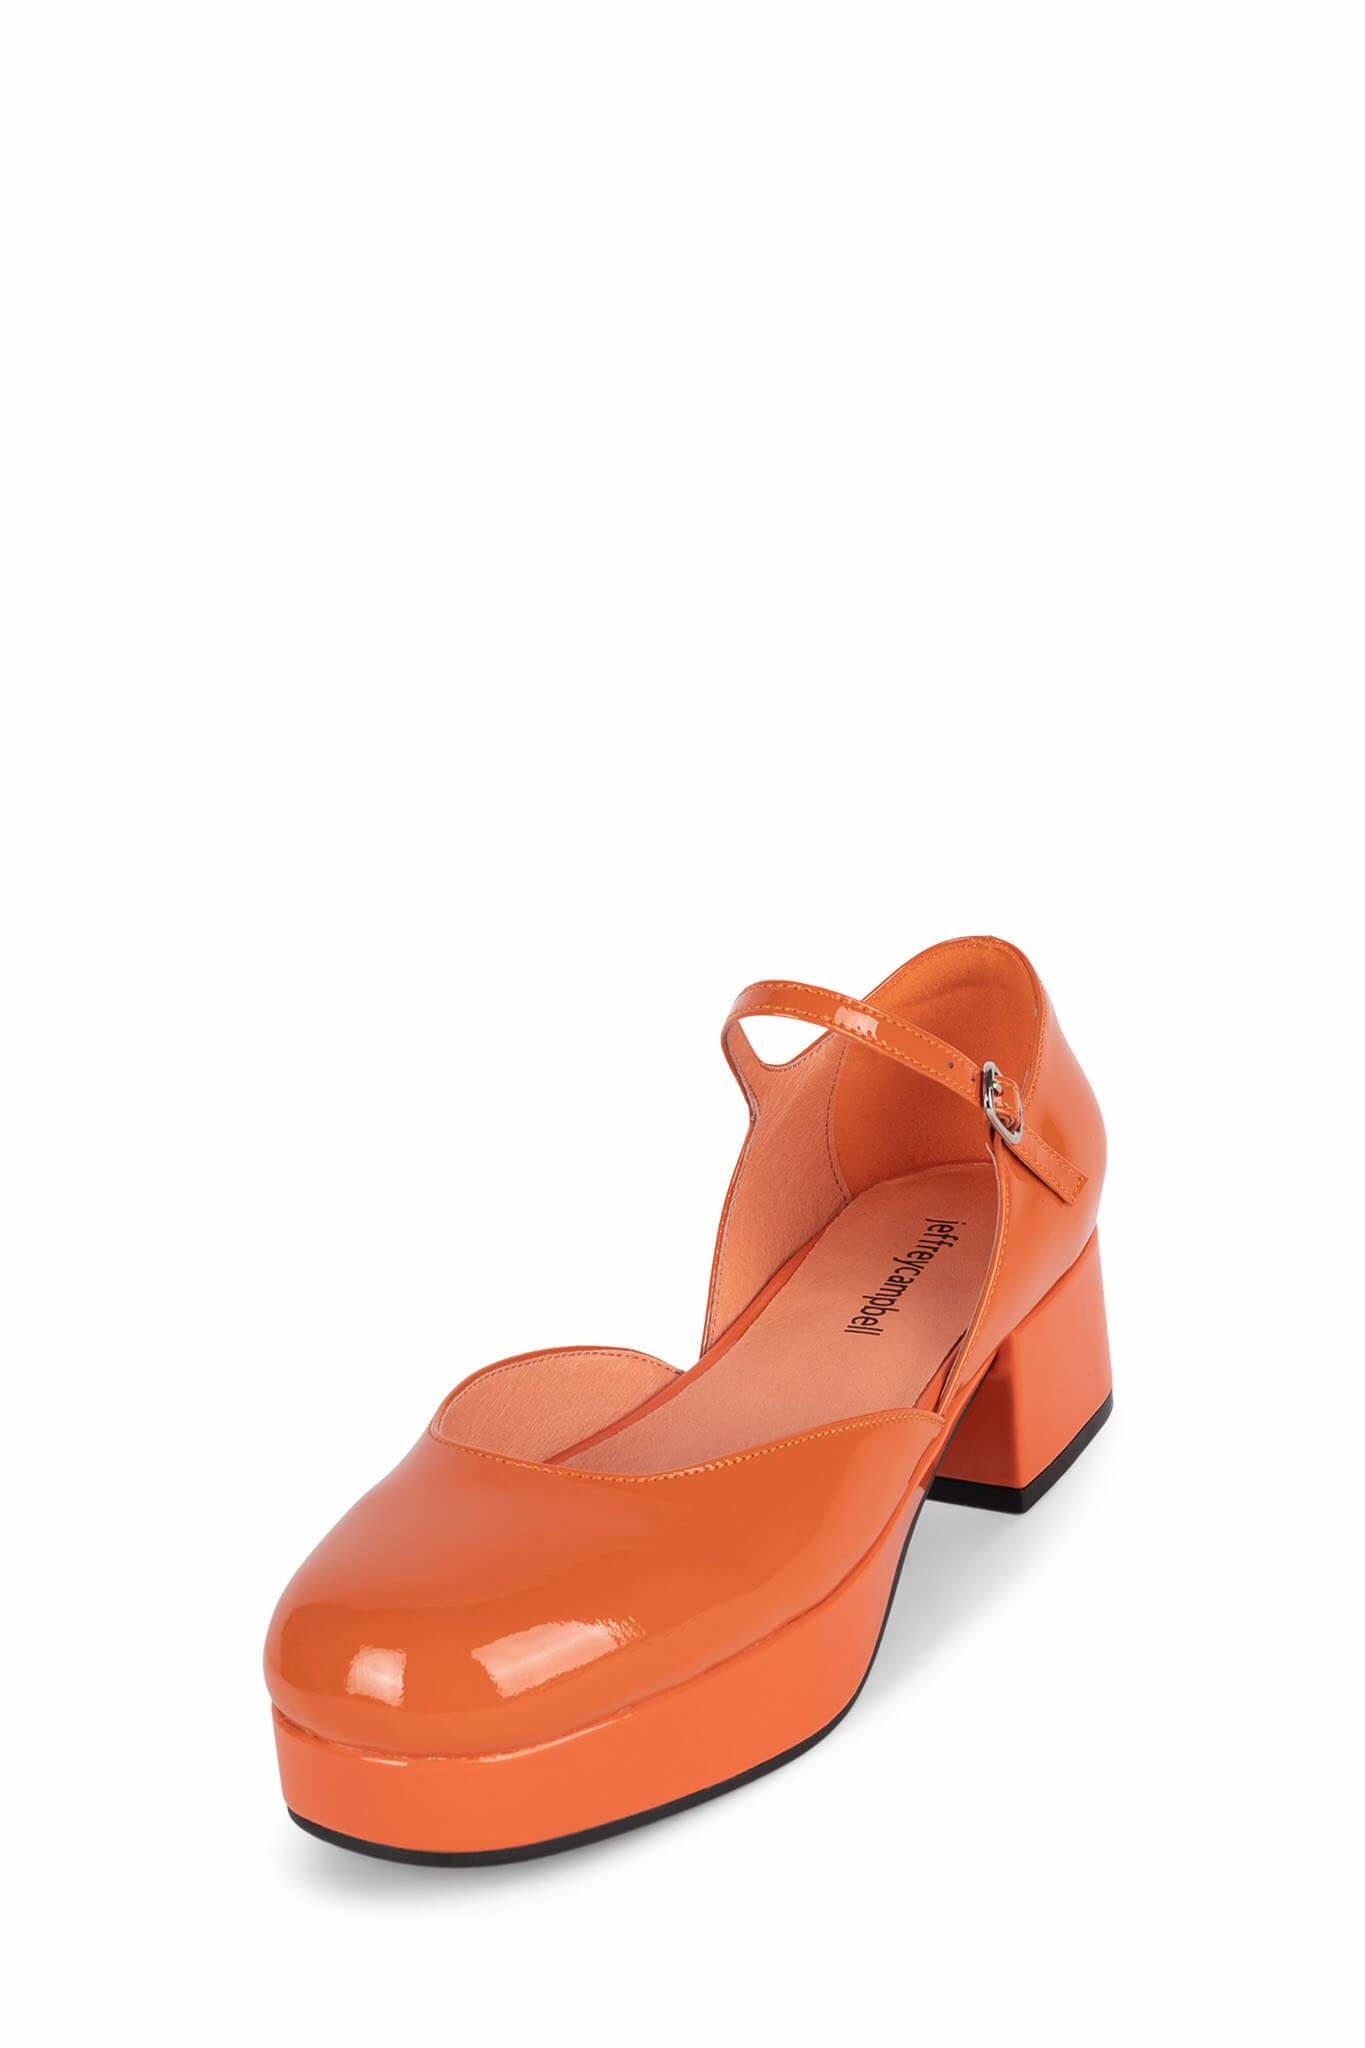 Jeffrey Campbell Ecolier Orange Patent